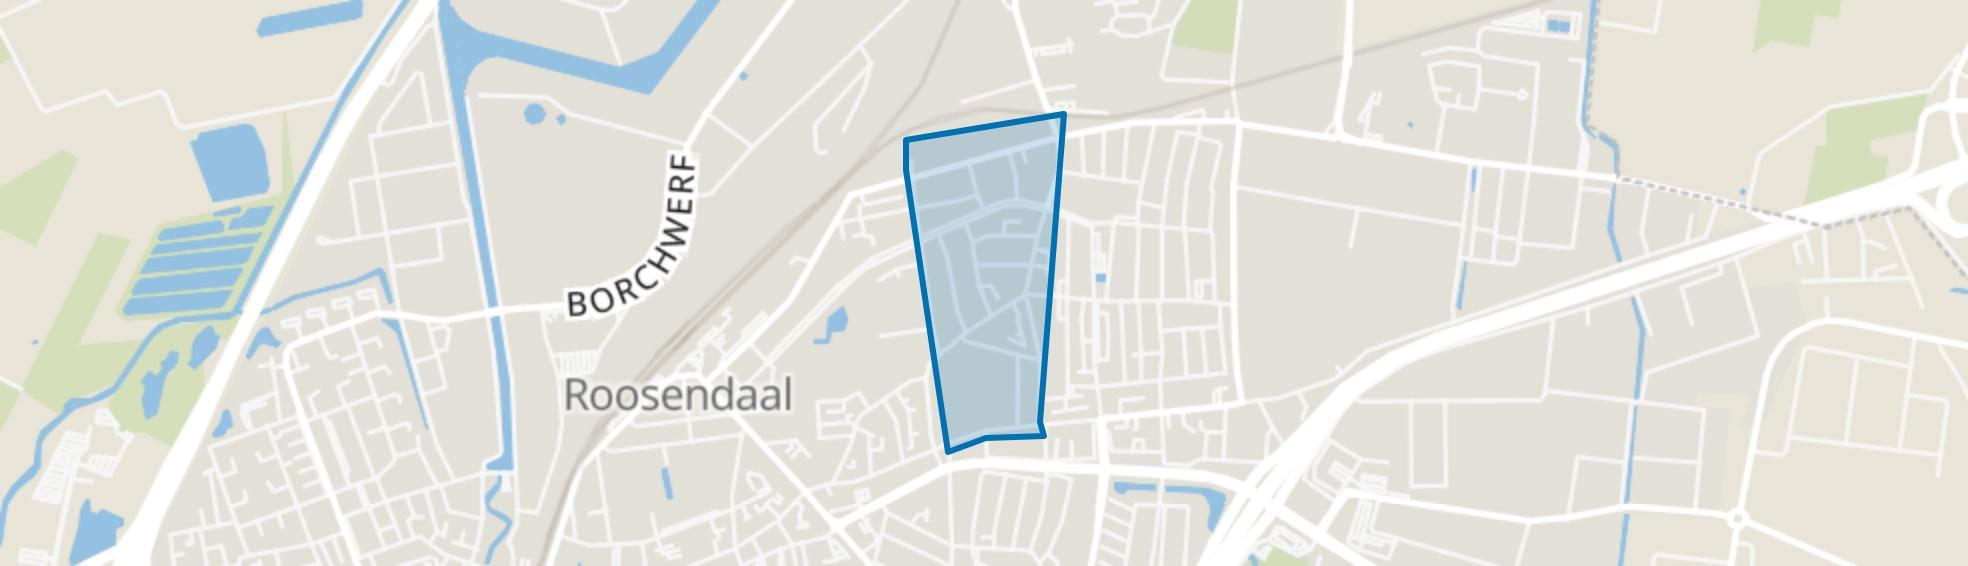 Spoorstraat-Van Coothlaan, Roosendaal map